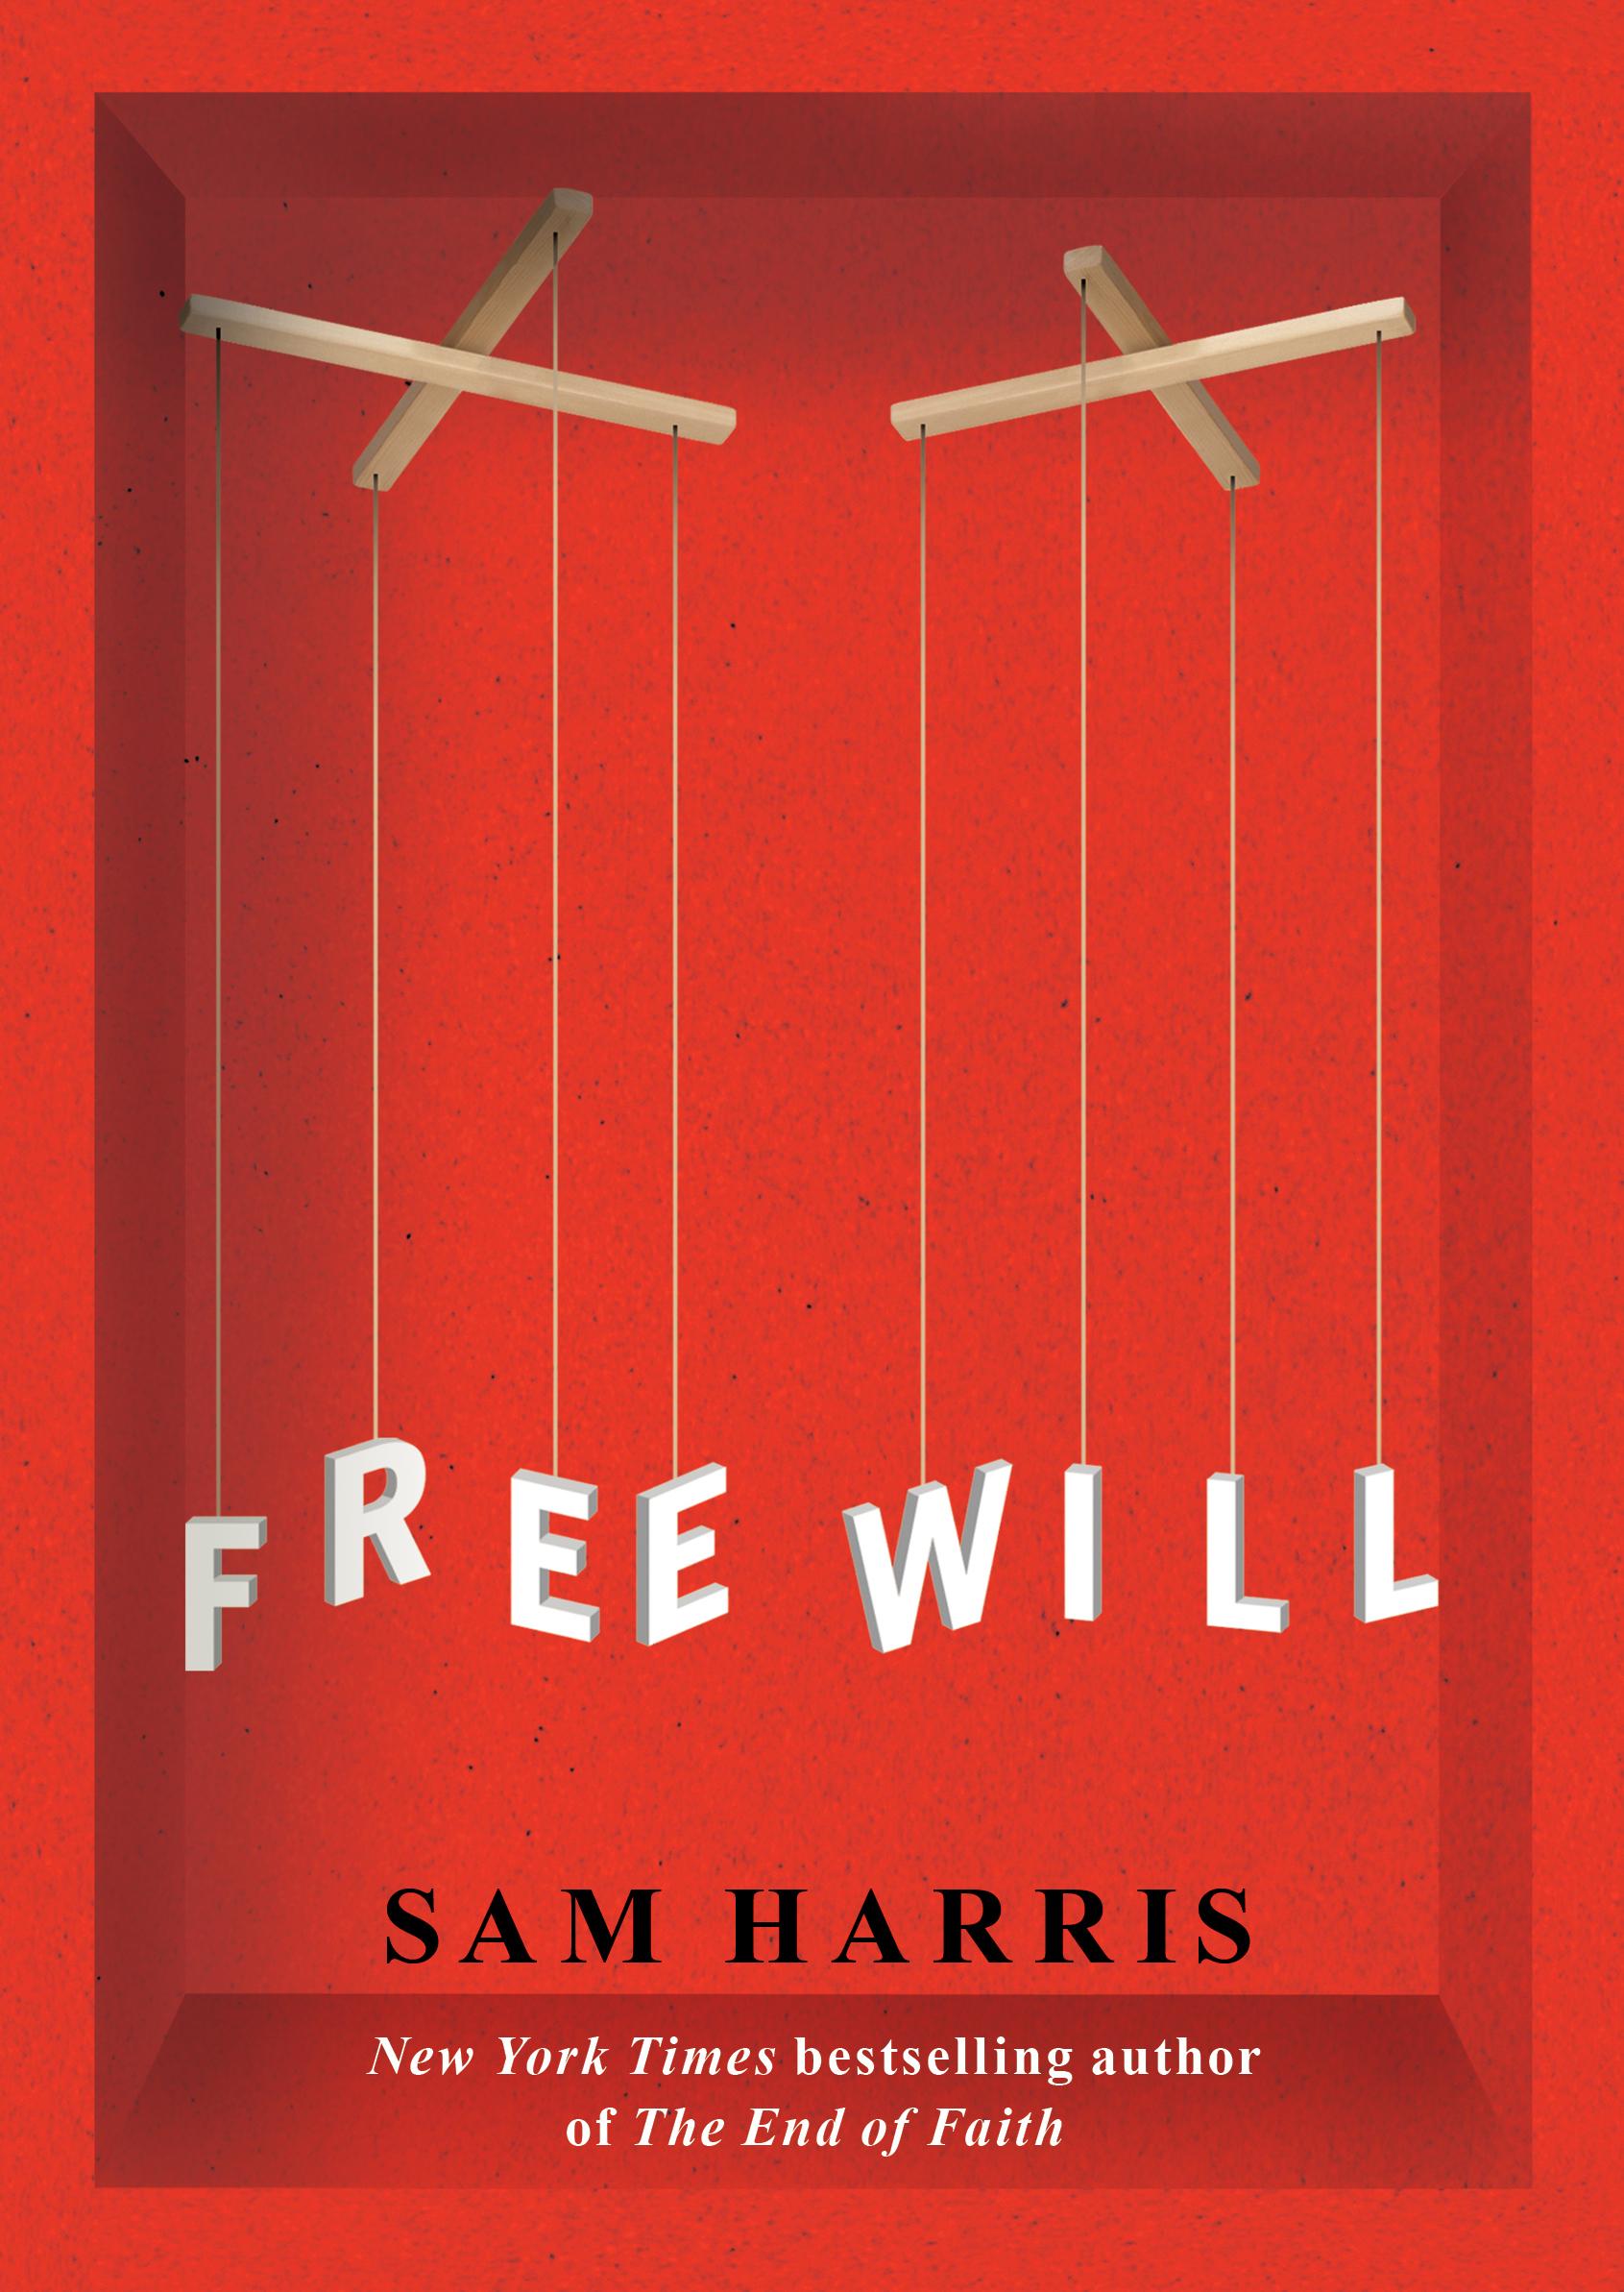 Sam harris books pdf